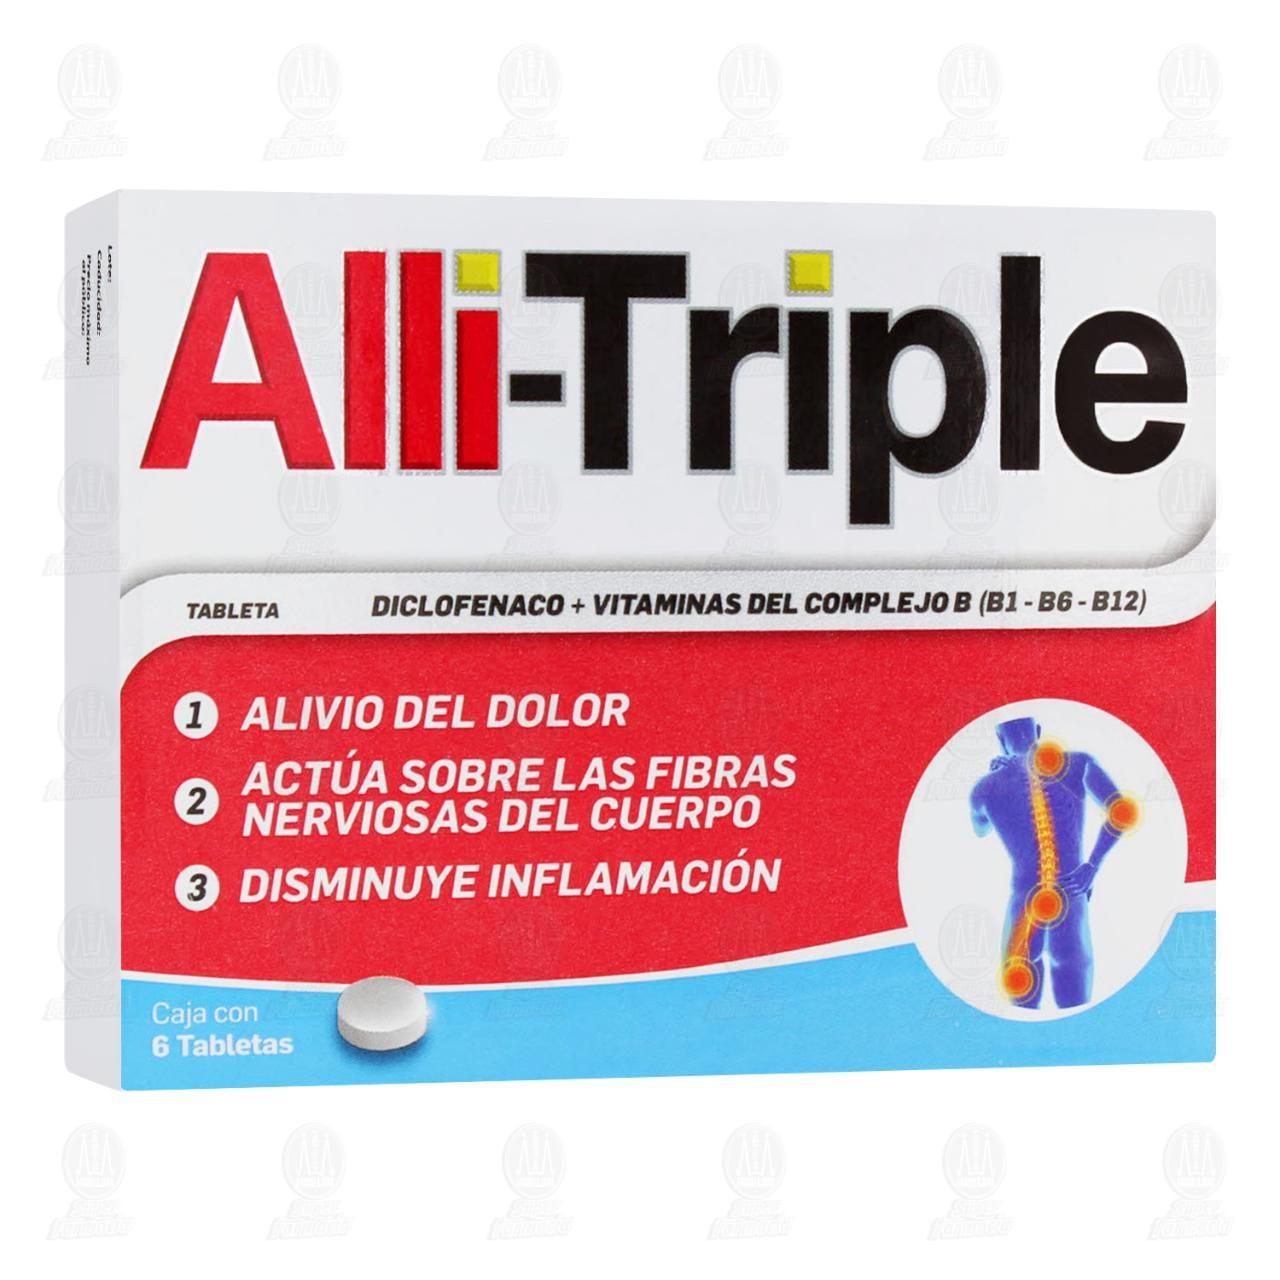 Comprar Alli-Triple 6 Tabletas en Farmacias Guadalajara